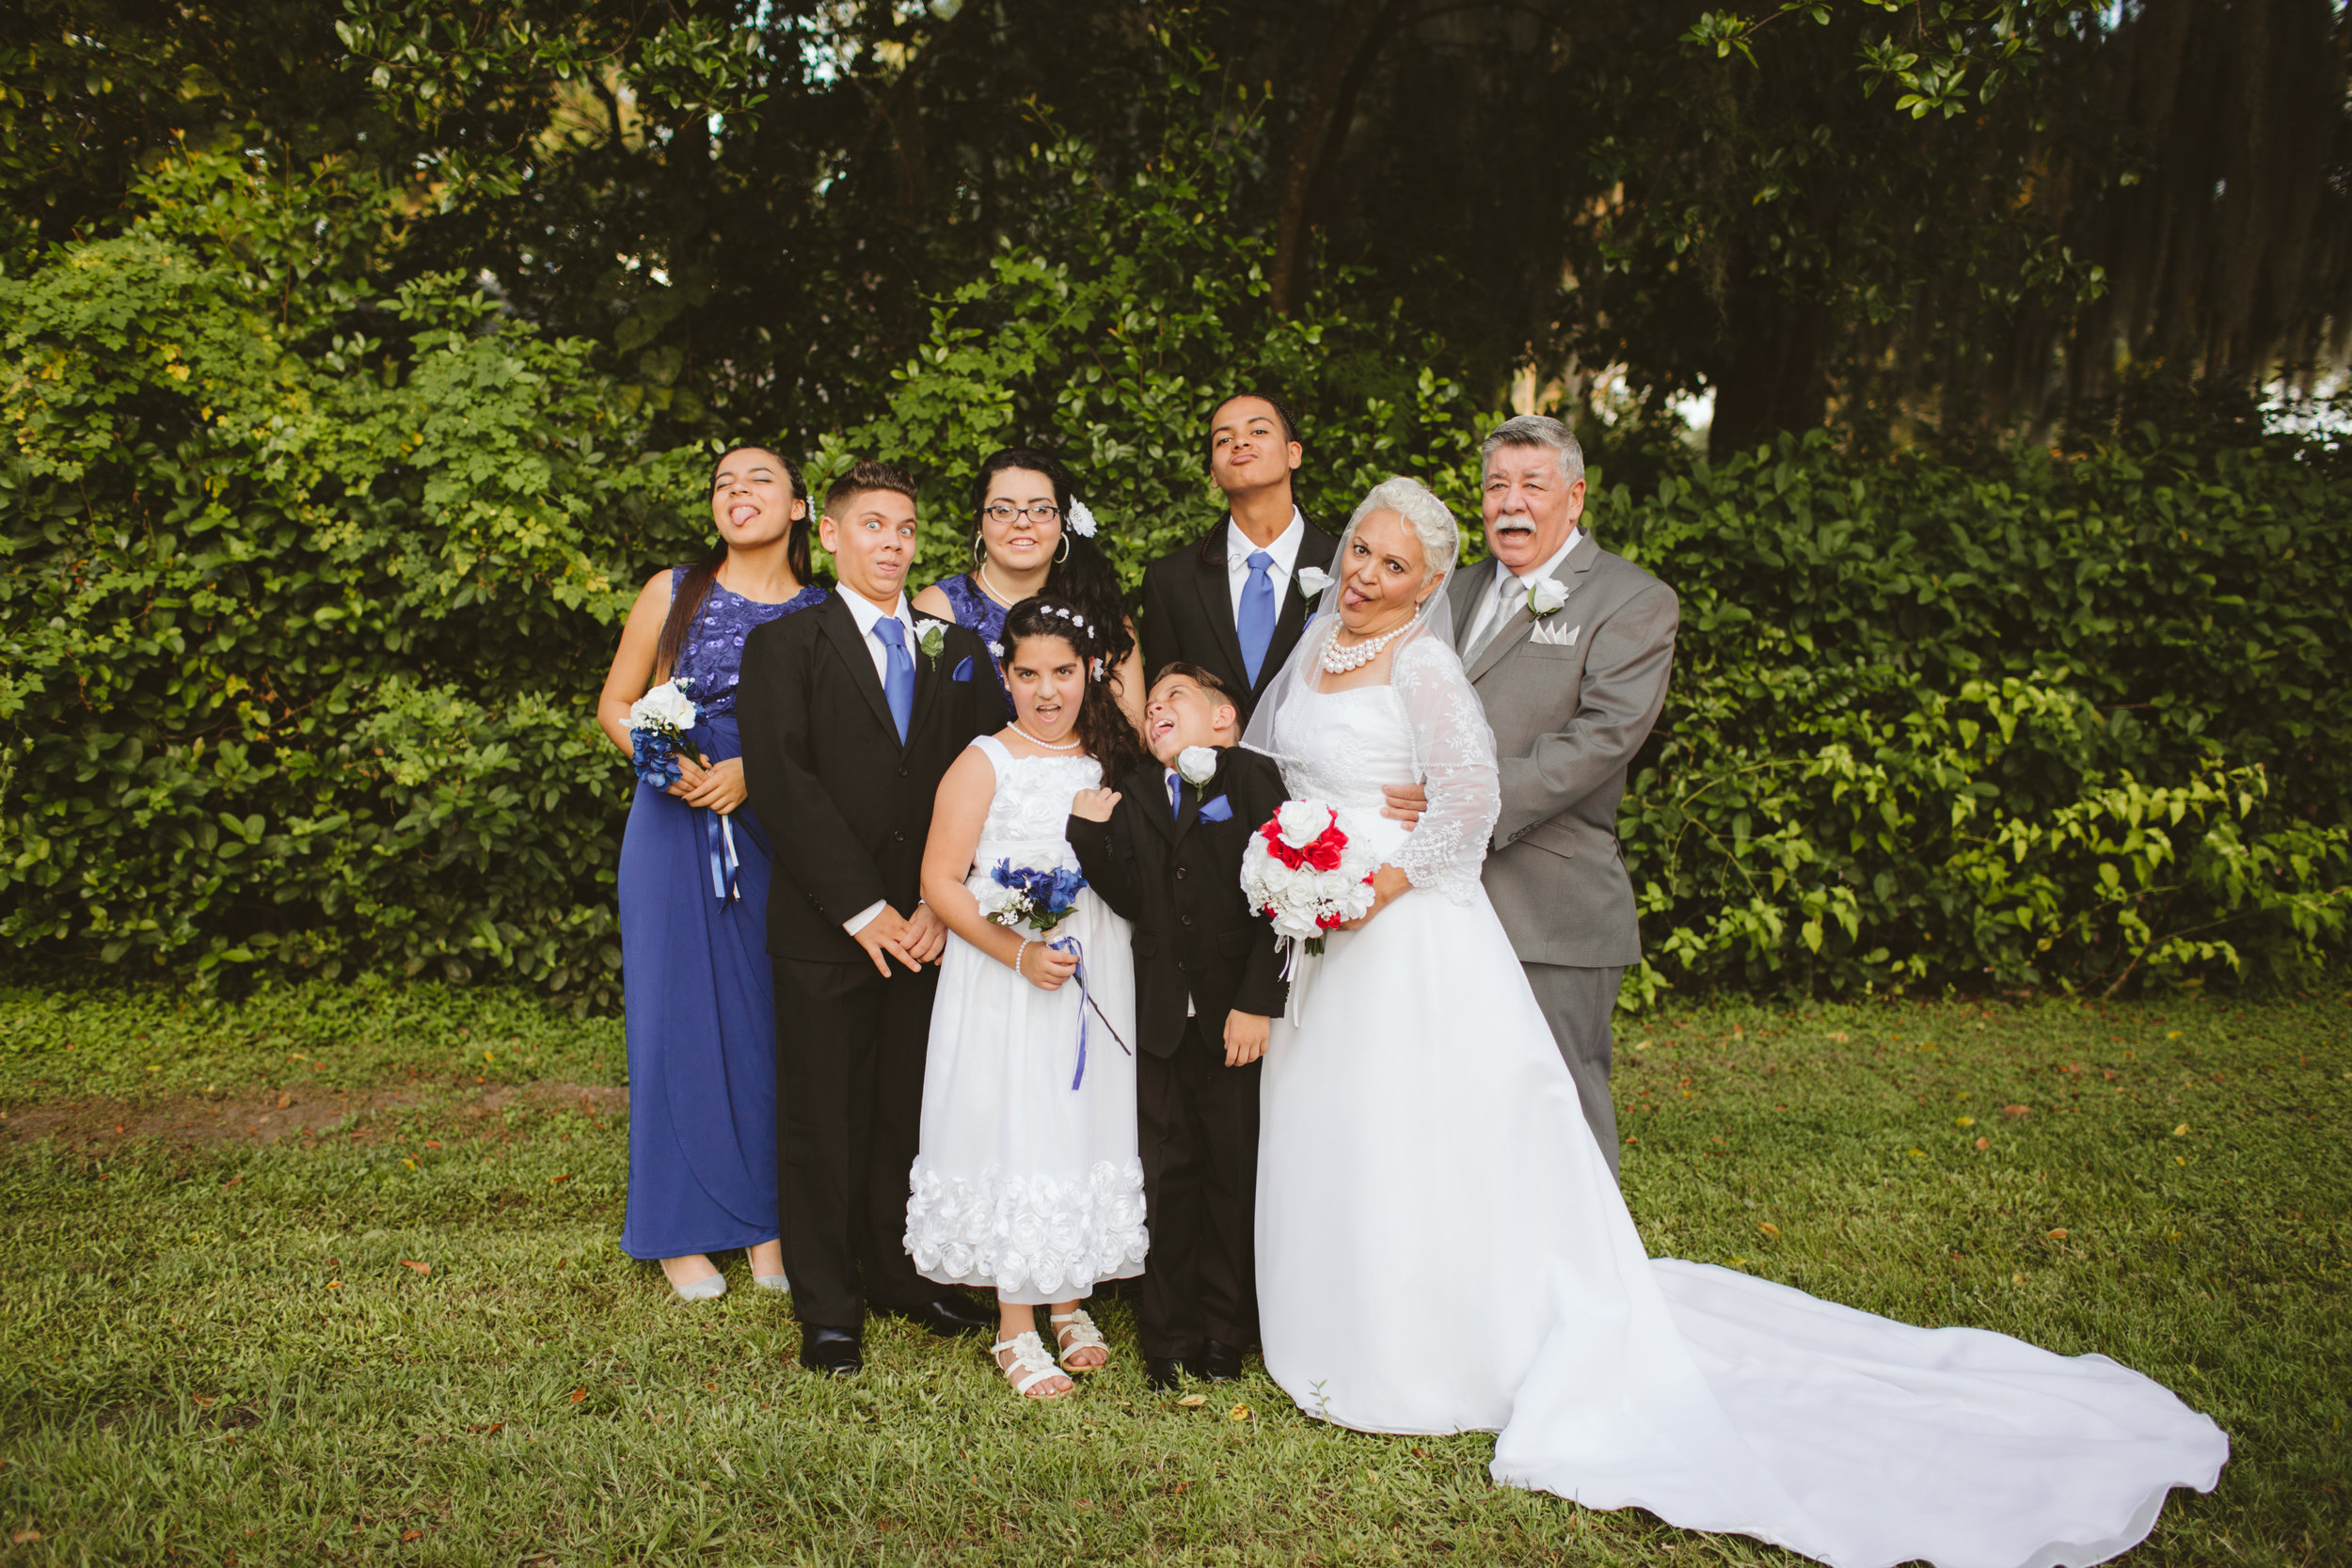 wedding | Vanessa Boy Photography | vanessaboy.com |-206.jpg